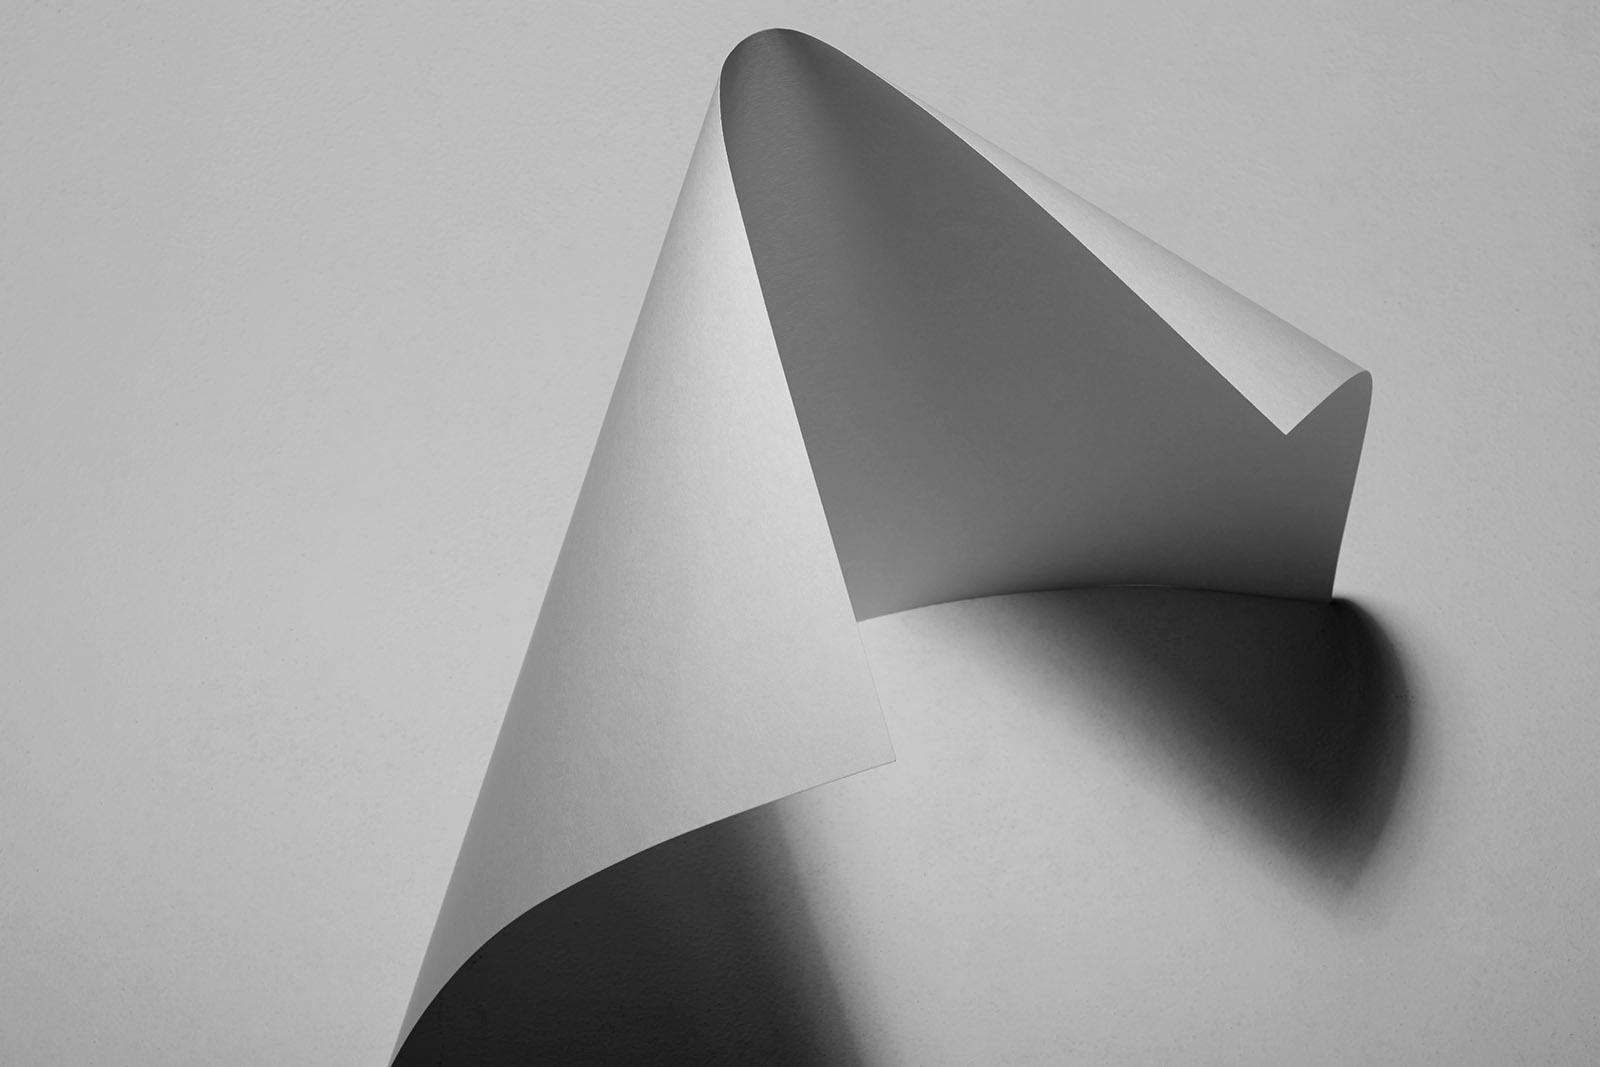 kwp-paper-2.jpg